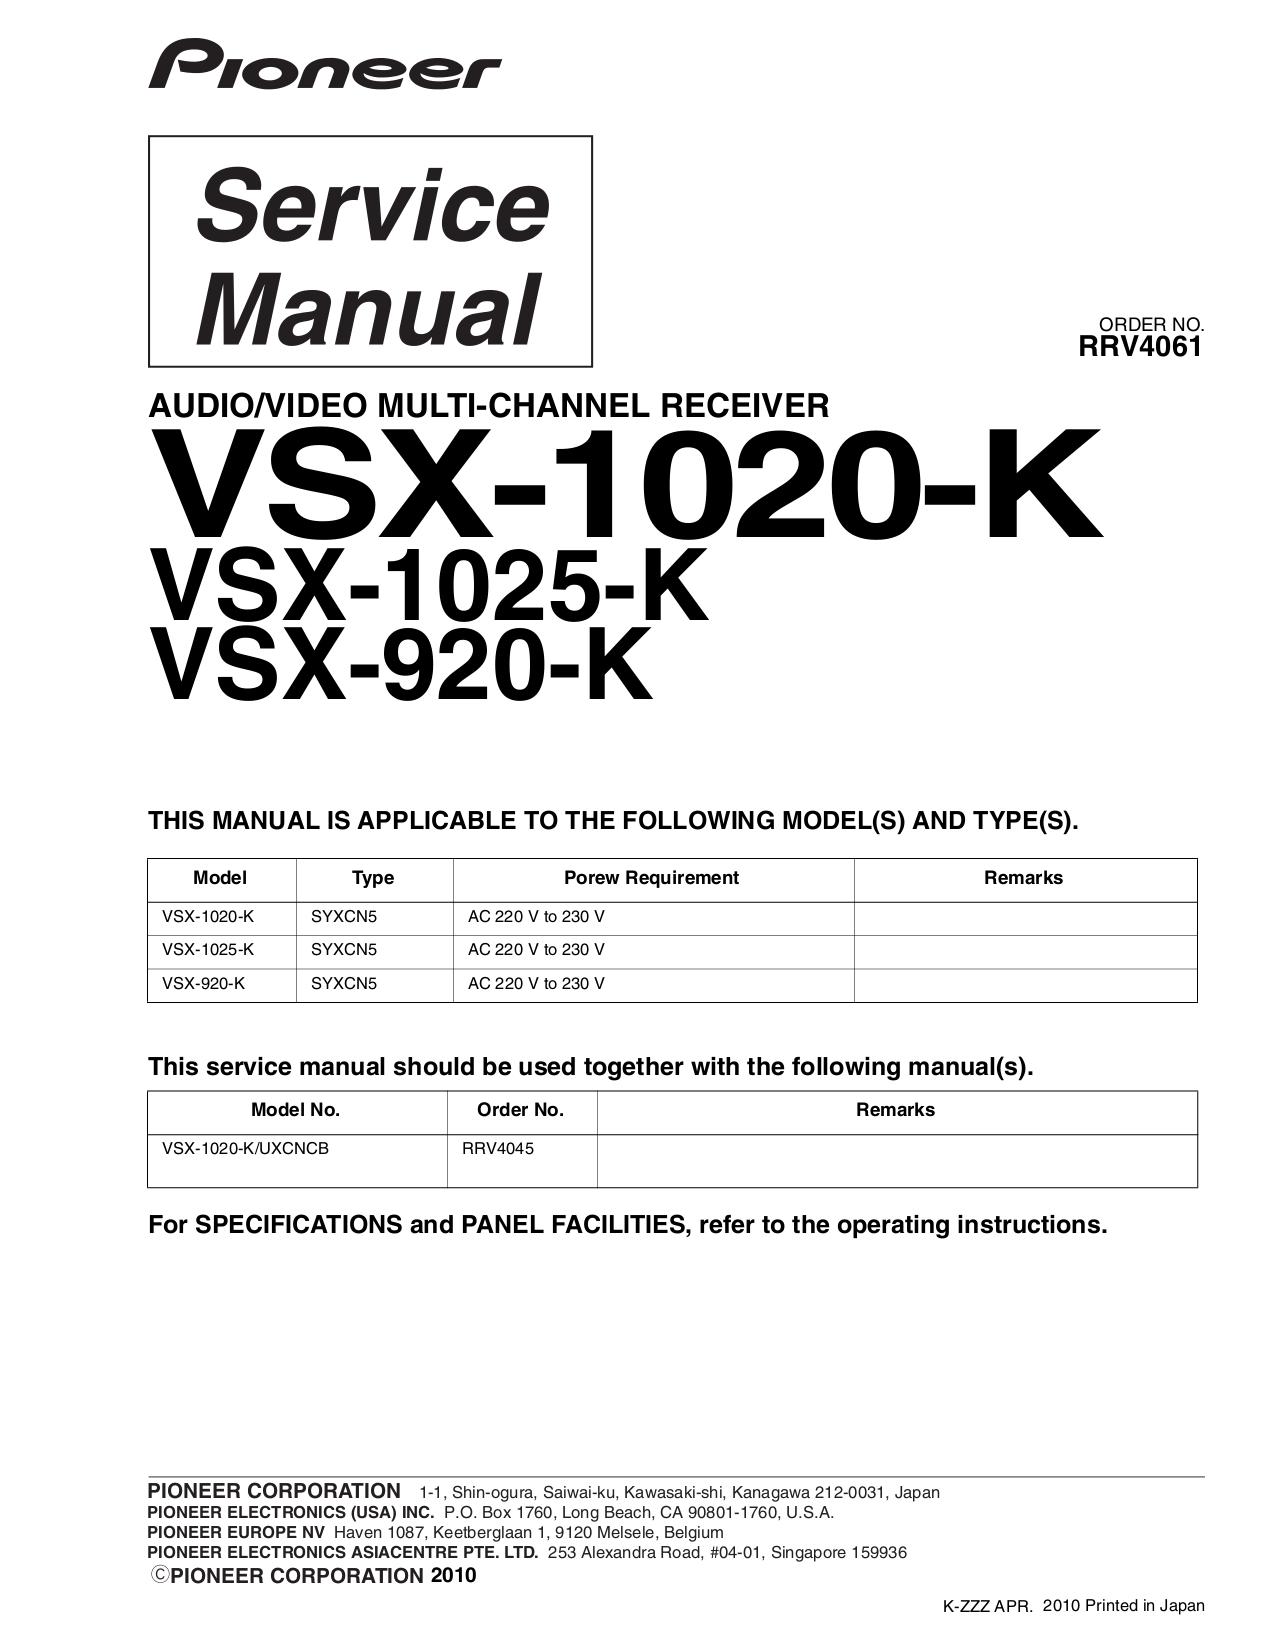 download free pdf for pioneer vsx 1020 k receiver manual rh umlib com pioneer vsx-920-k service manual Vizio Service Manuals